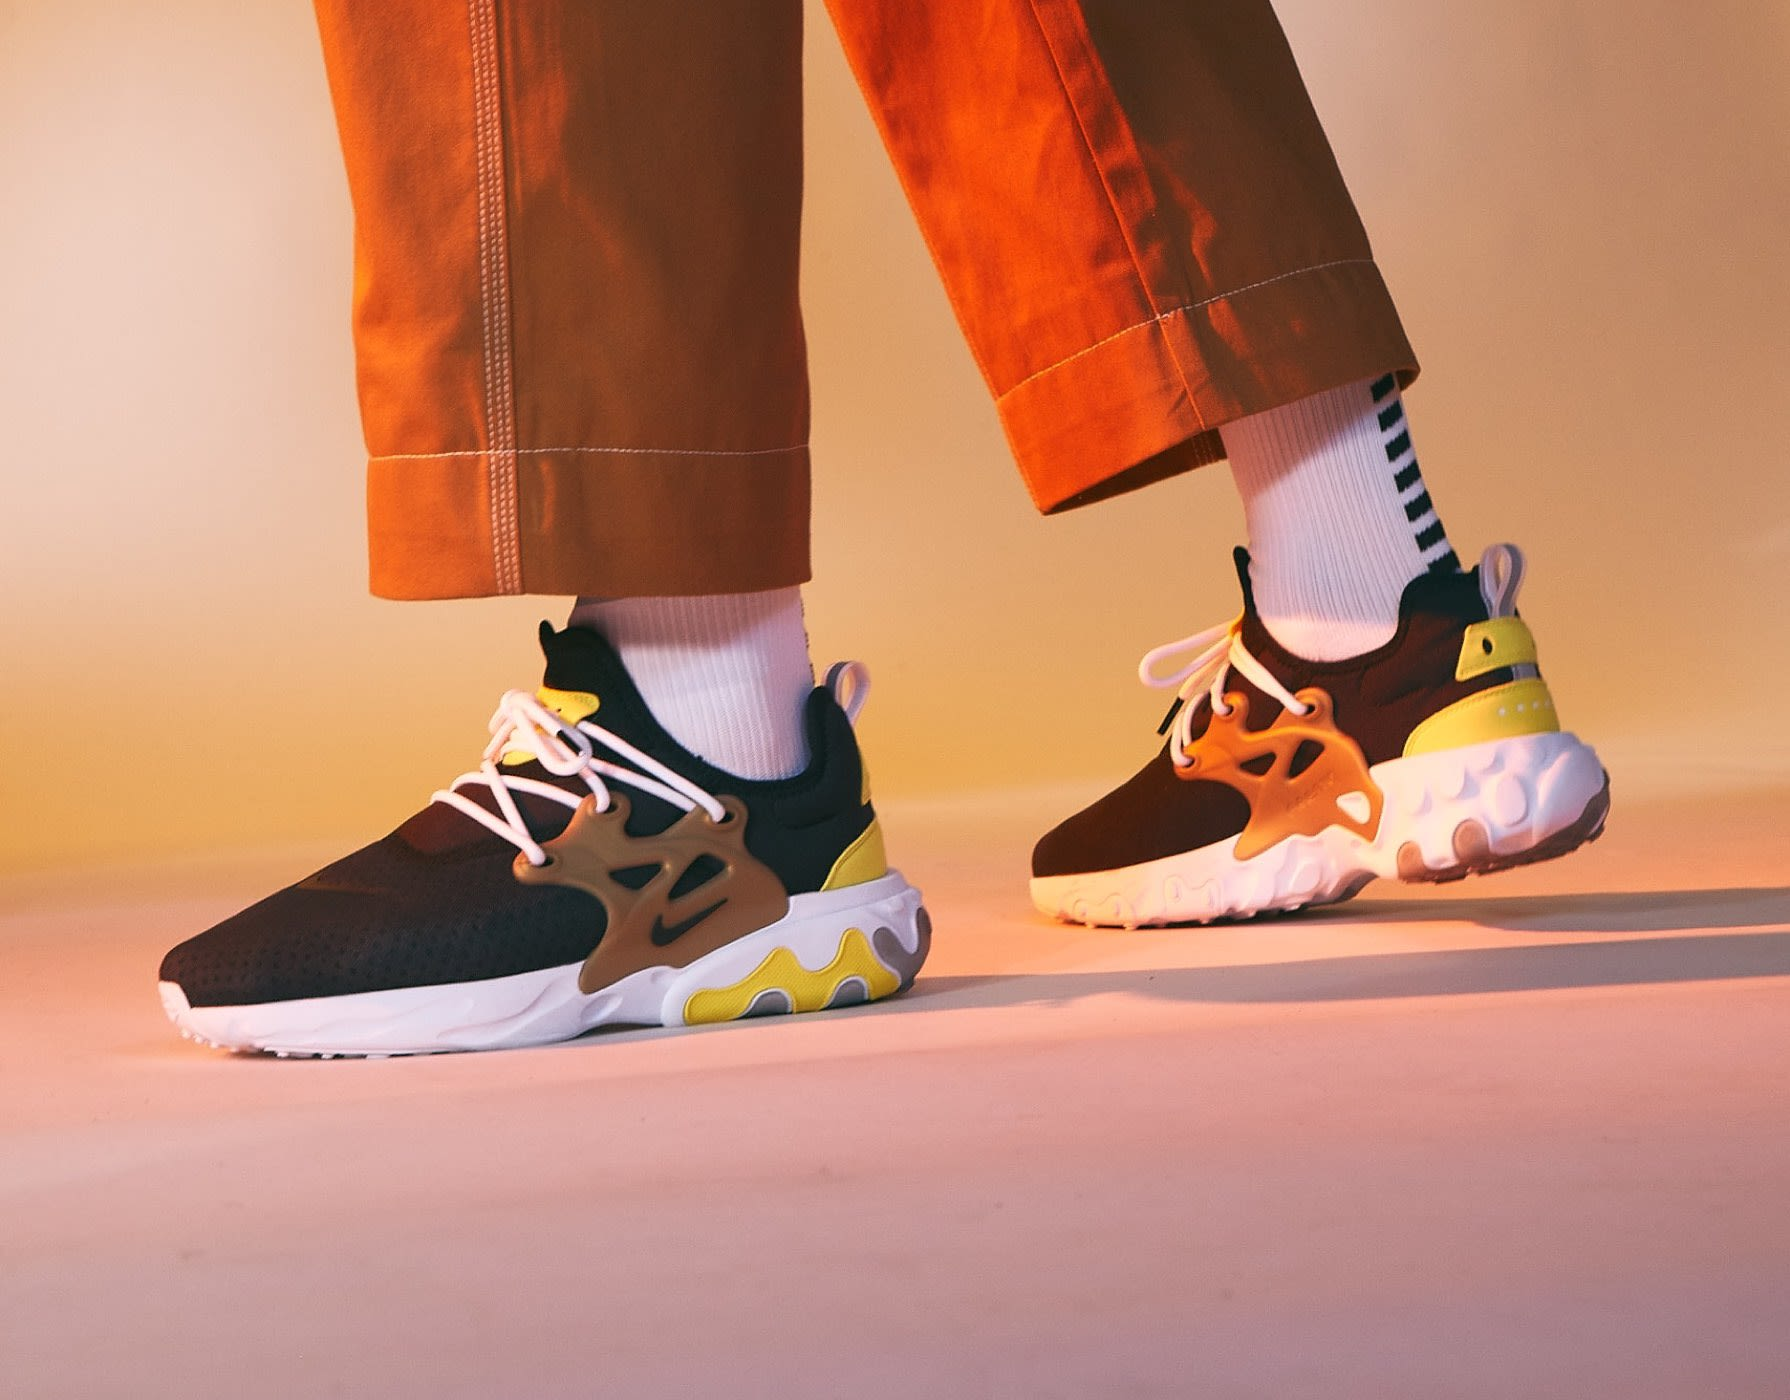 new arrival ebbdd 04b9a Nike. Just Do It. Nike.com